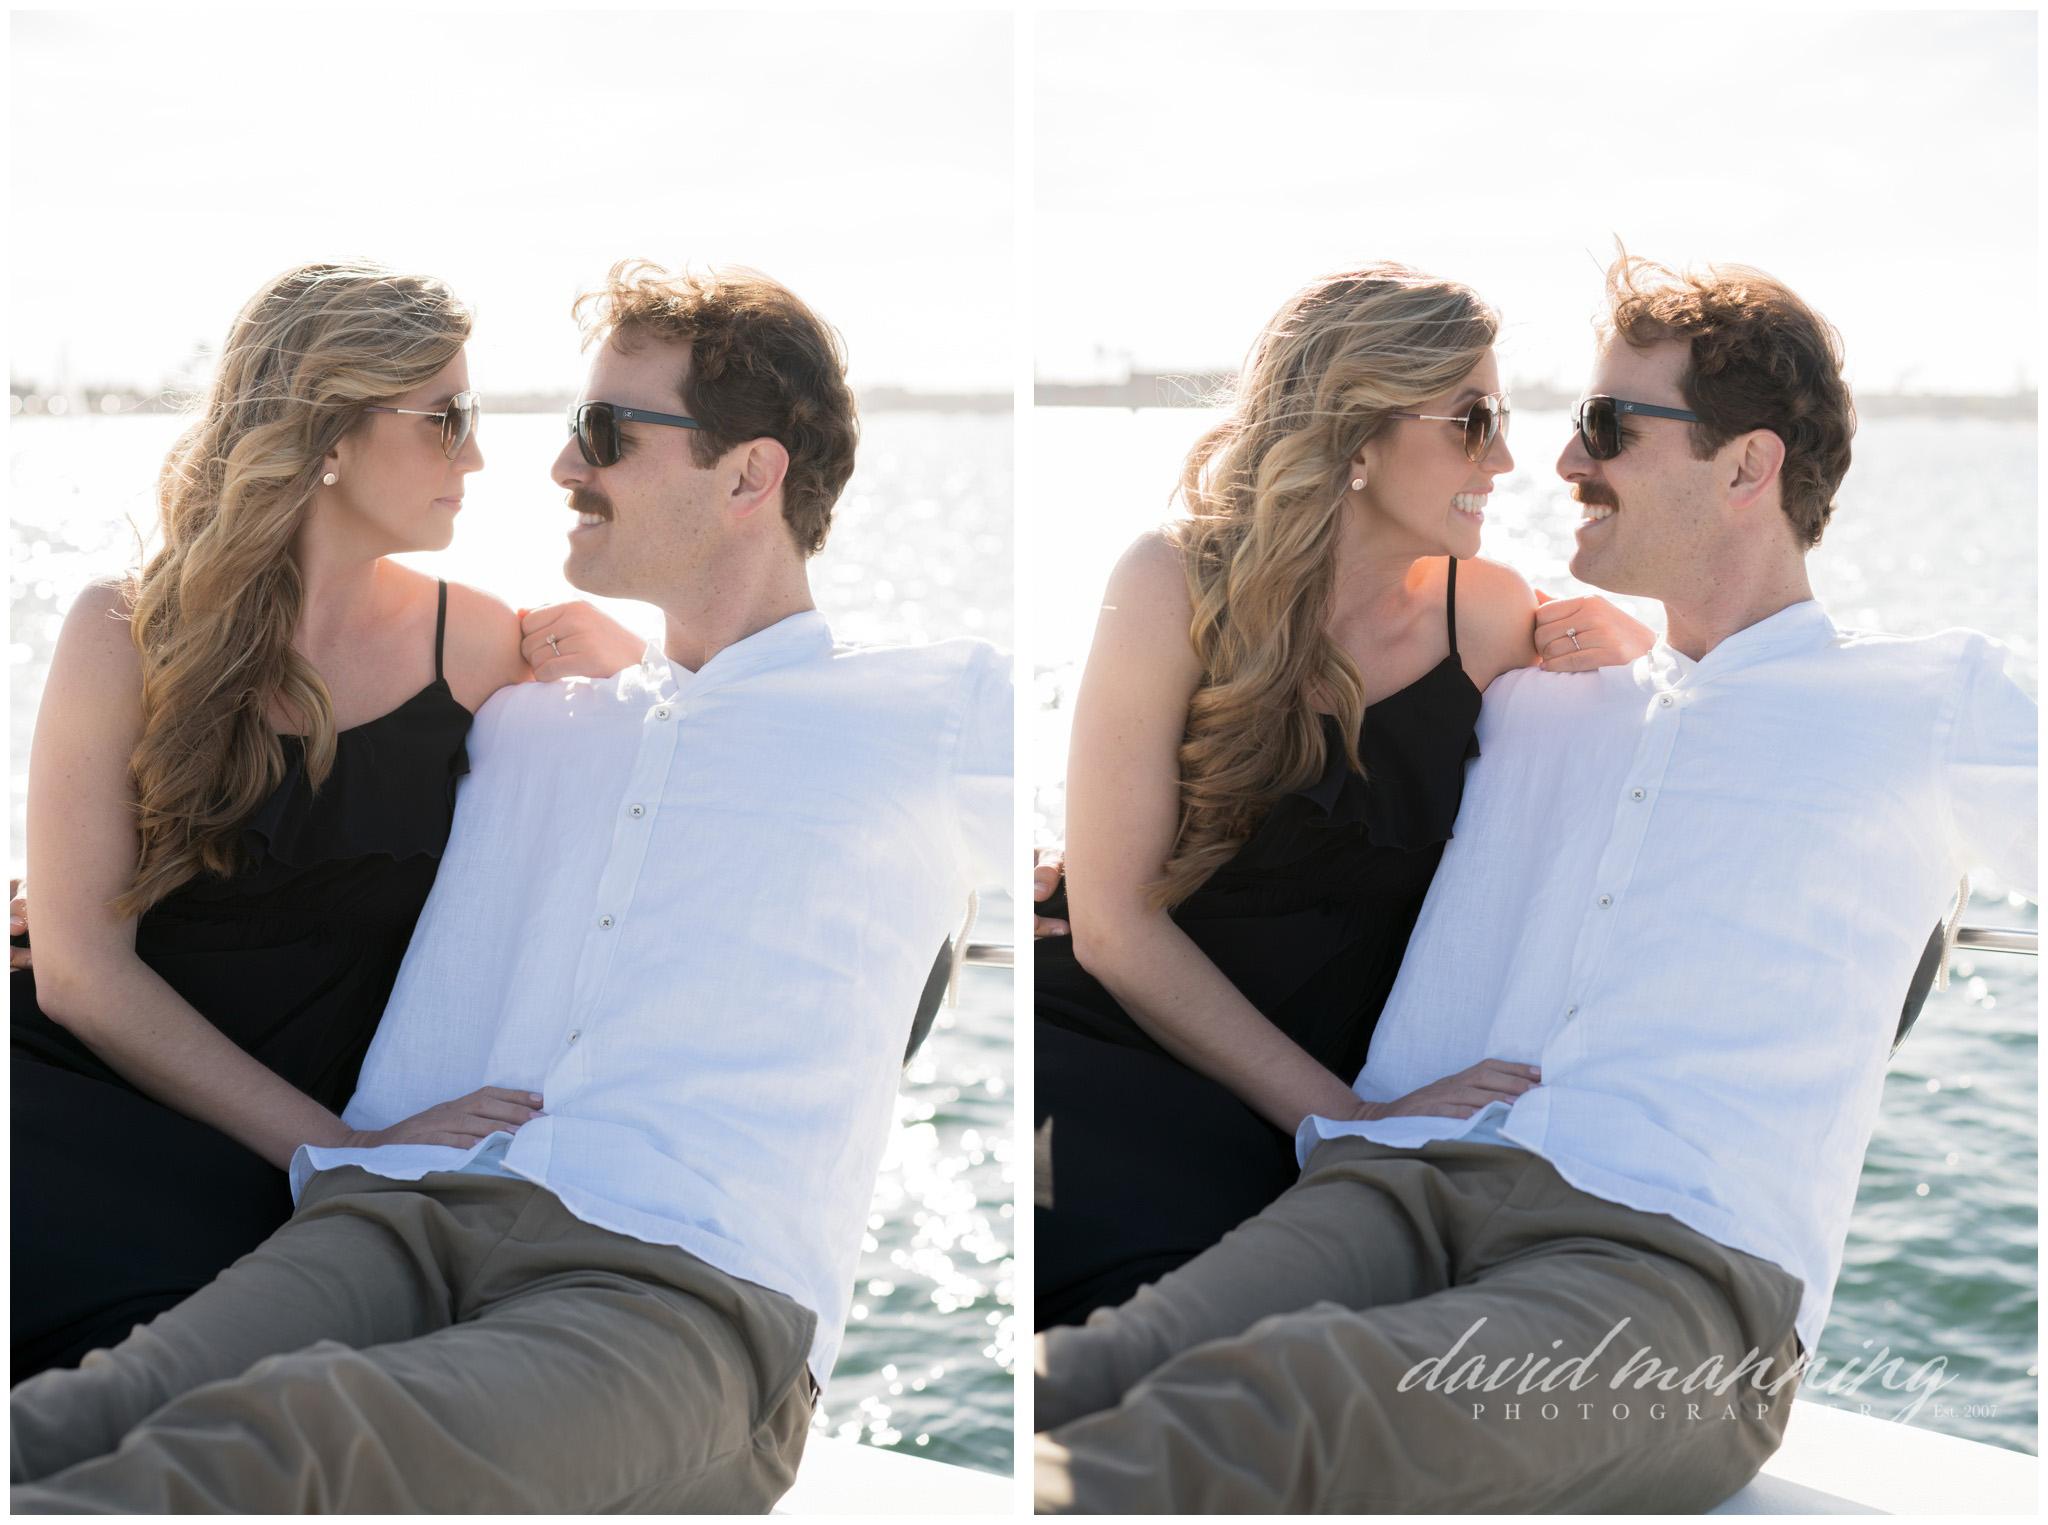 Alyssa-Taylor-Engagement-David-Manning-Photographer-0046.JPG